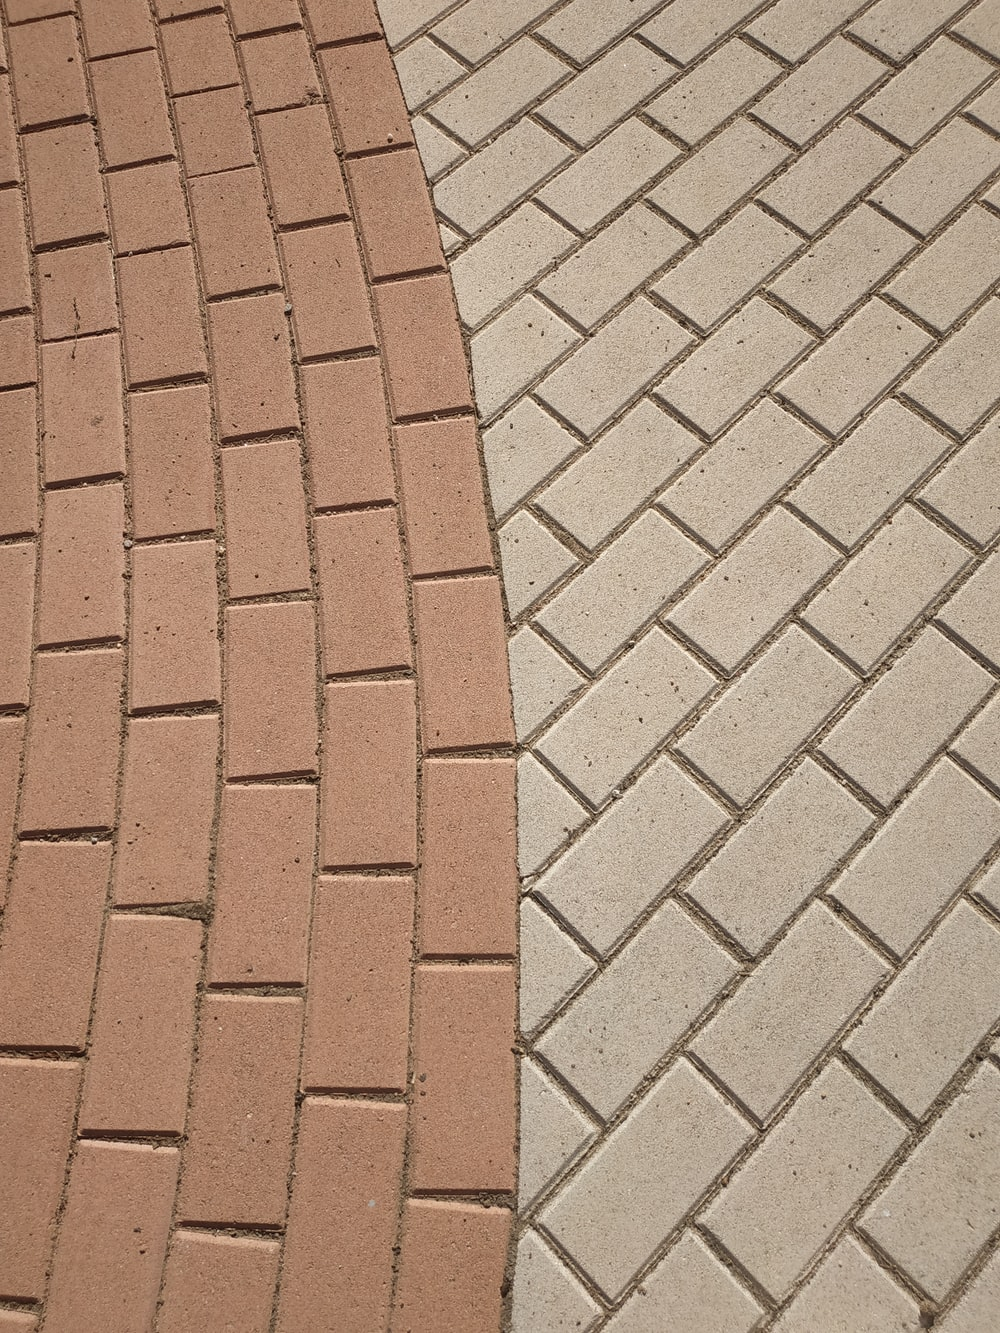 brown and gray brick pavement